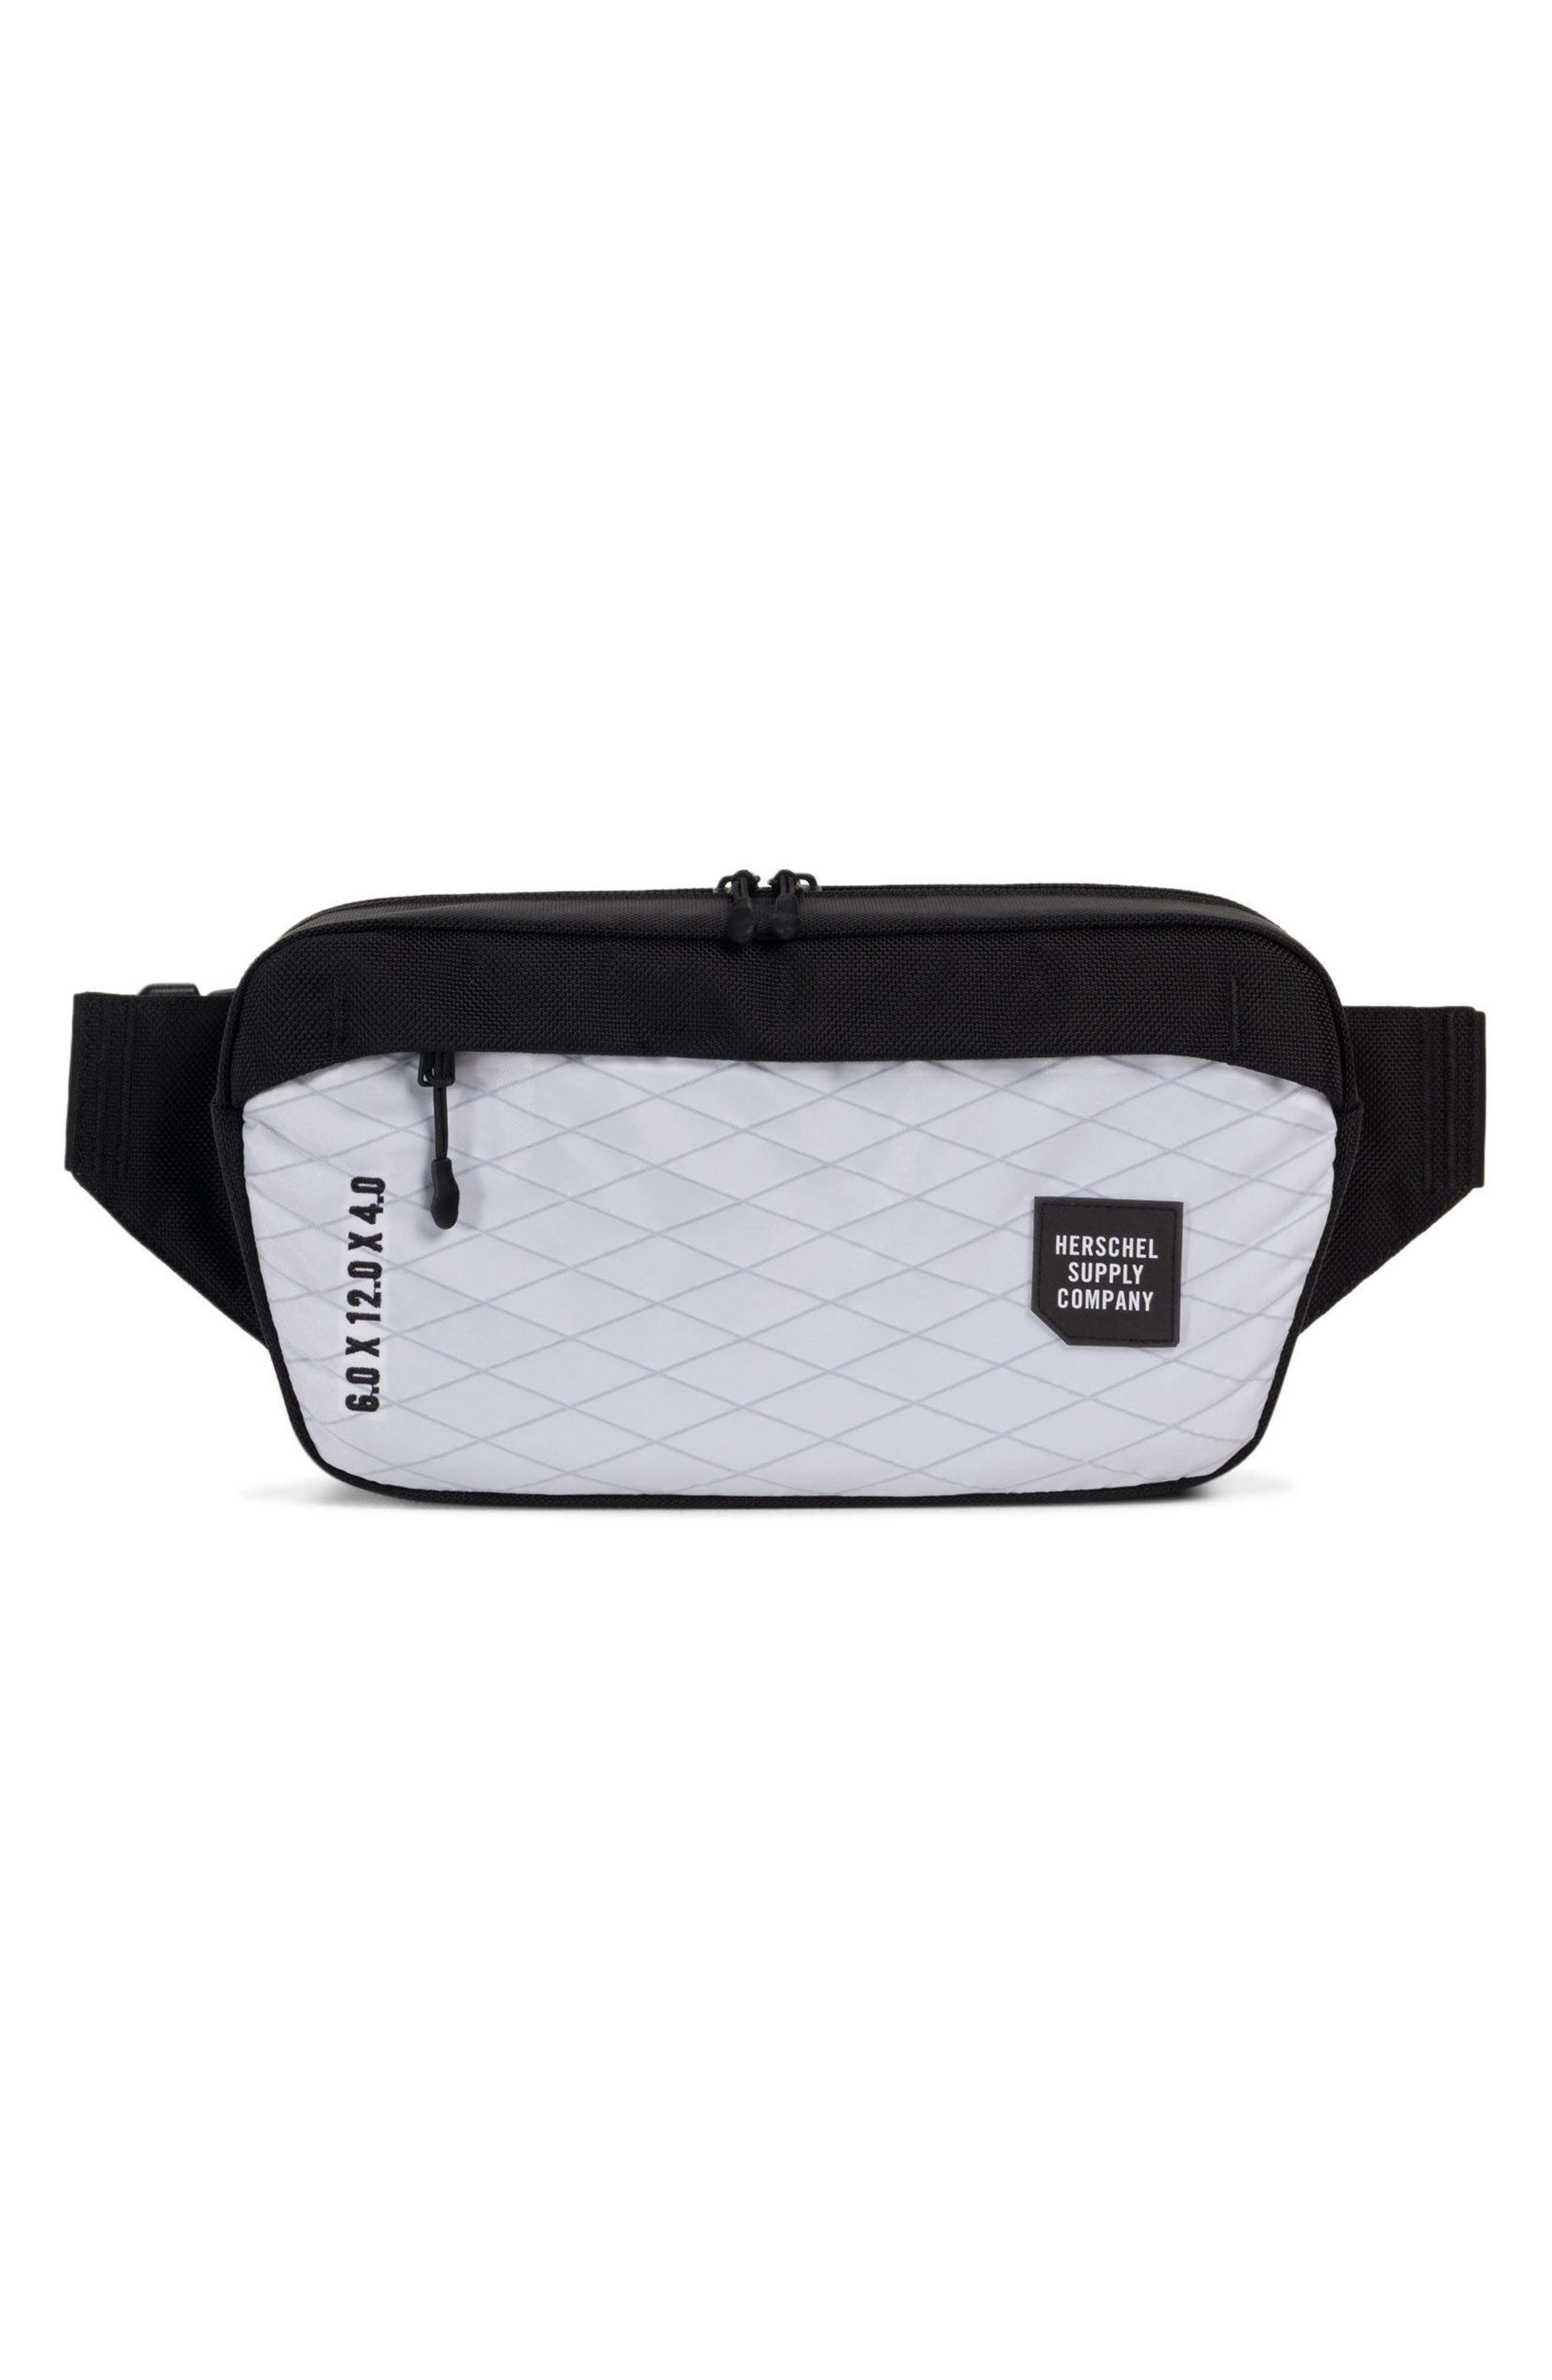 Trail Sailcloth Mammoth Belt Bag,                         Main,                         color, White/ Black